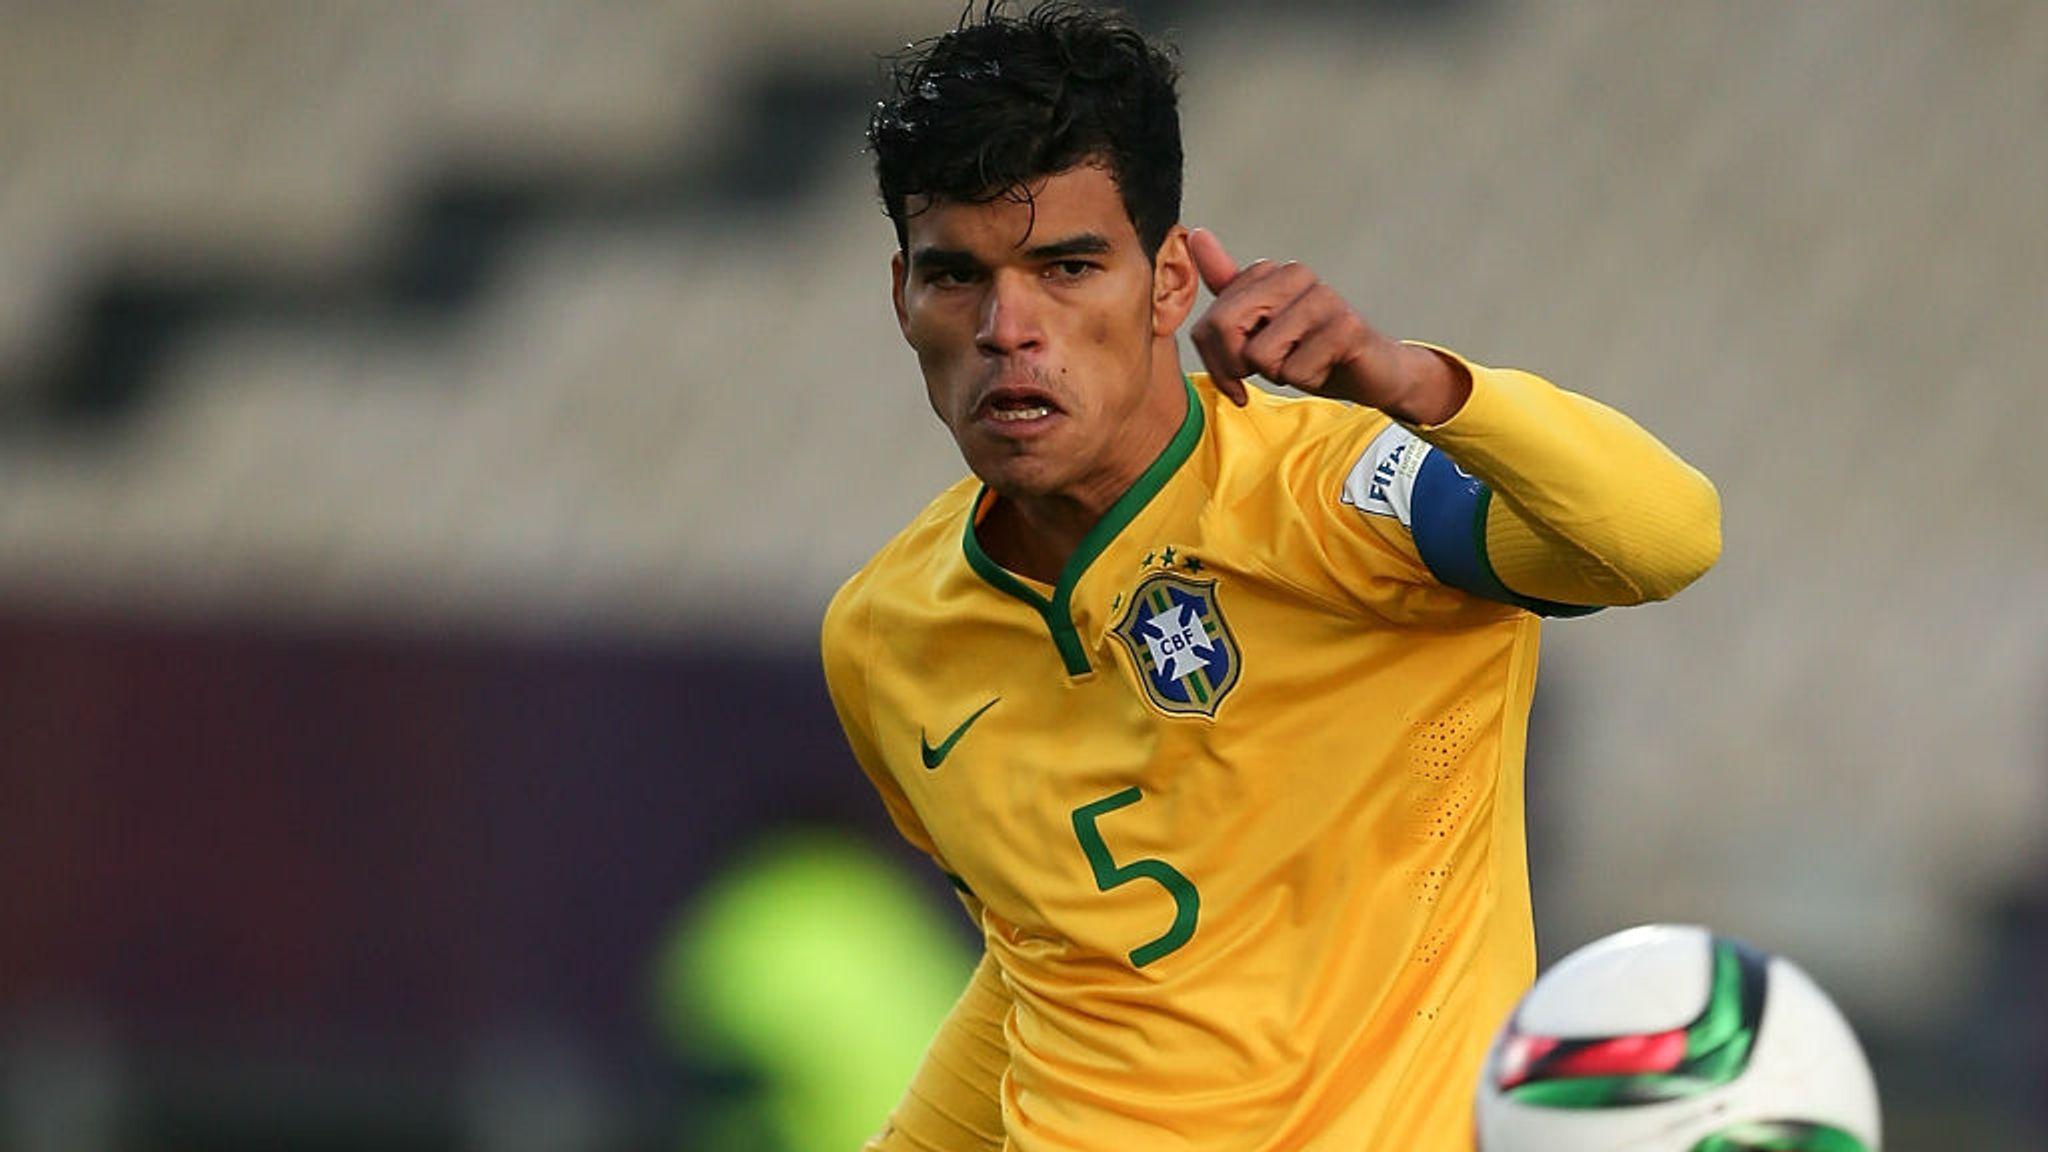 Valencia sign Danilo Barbosa on loan from Braga | Football News | Sky Sports